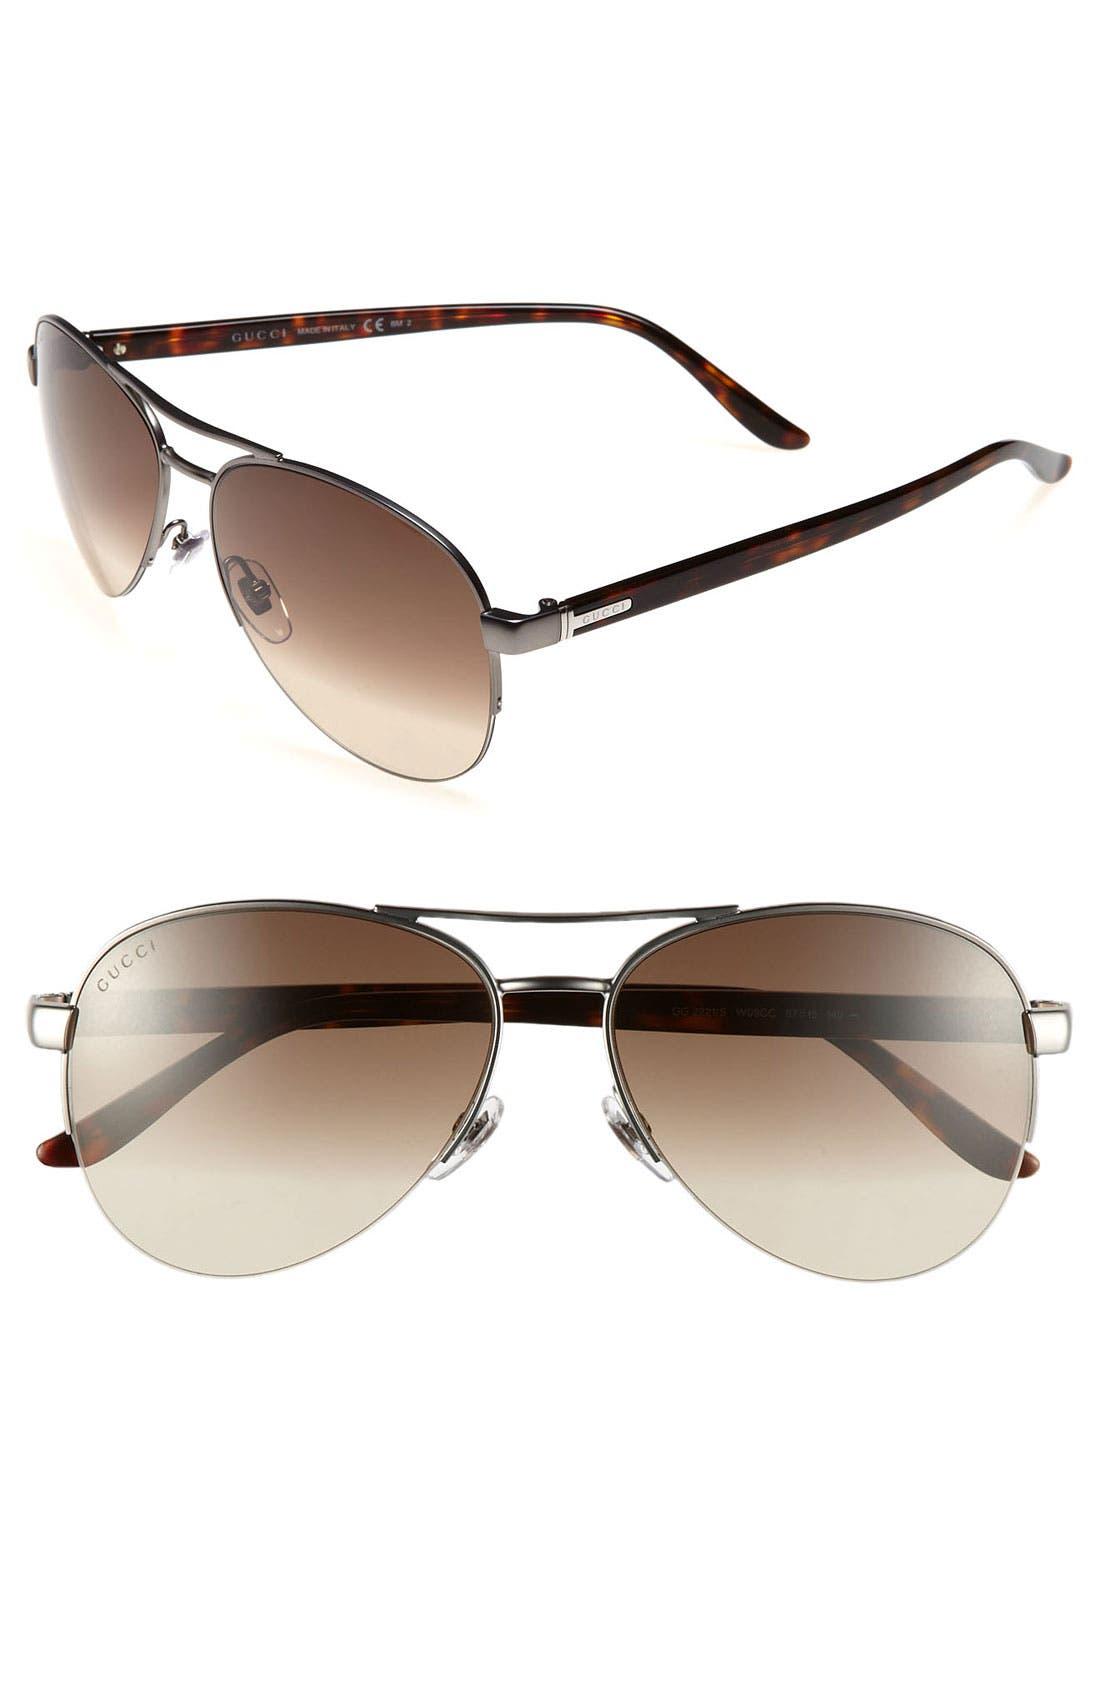 Main Image - Gucci Metal 57mm Aviator Sunglasses